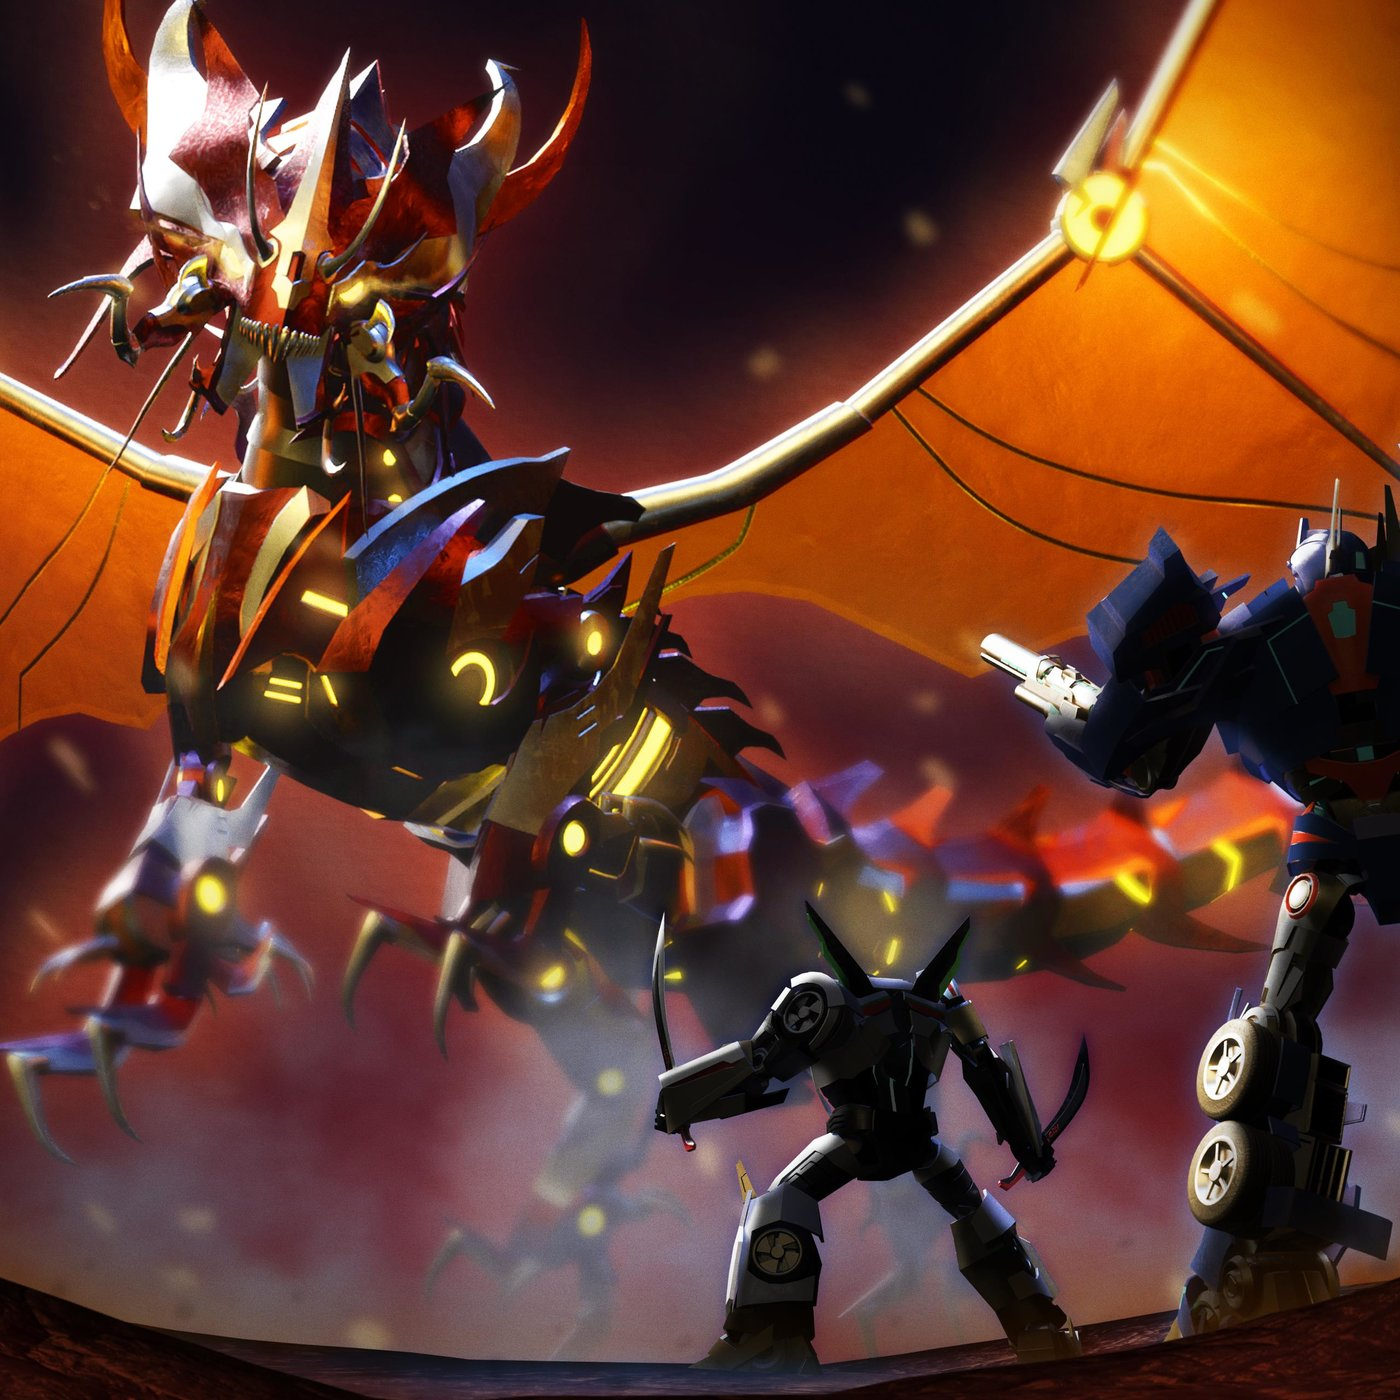 Predaking / Transformers Prime